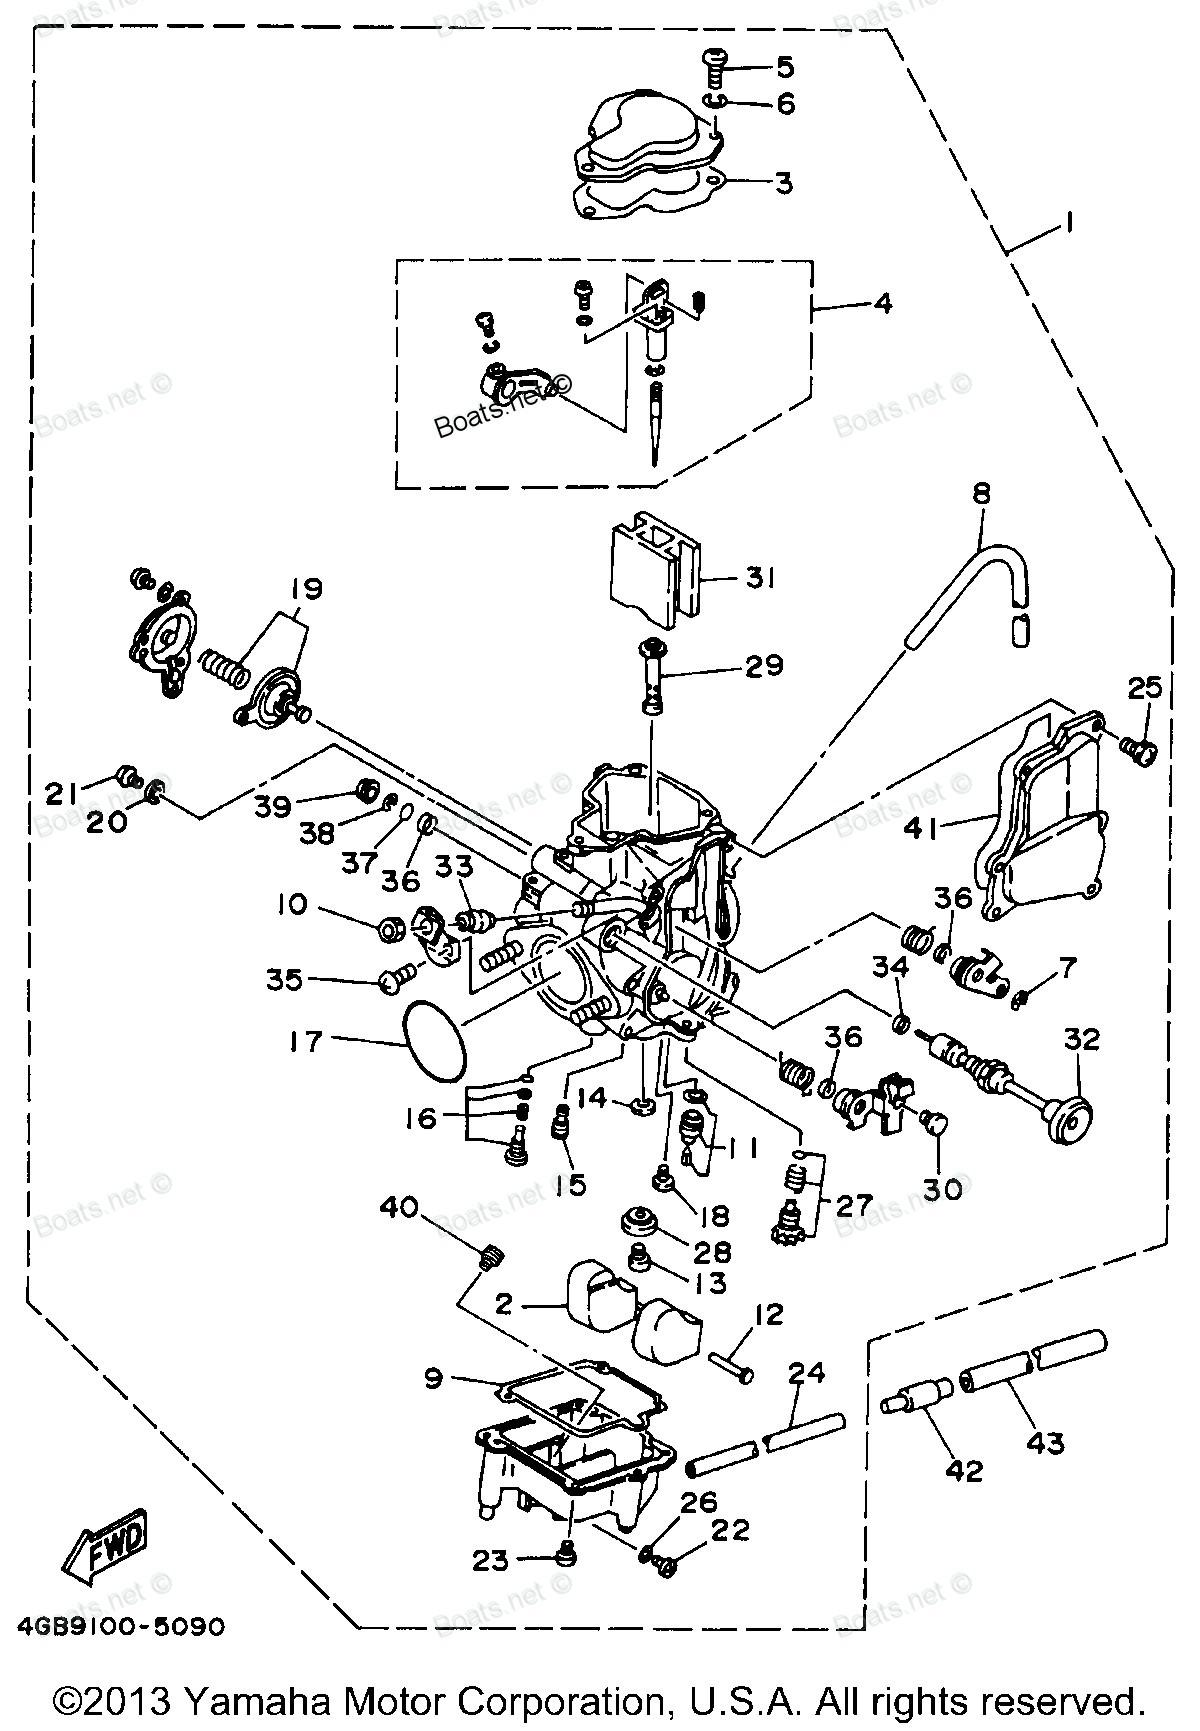 350 Engine Firing order Diagram Chevy Hei Distributor Wiring Diagram Chevy  Wiring Diagram